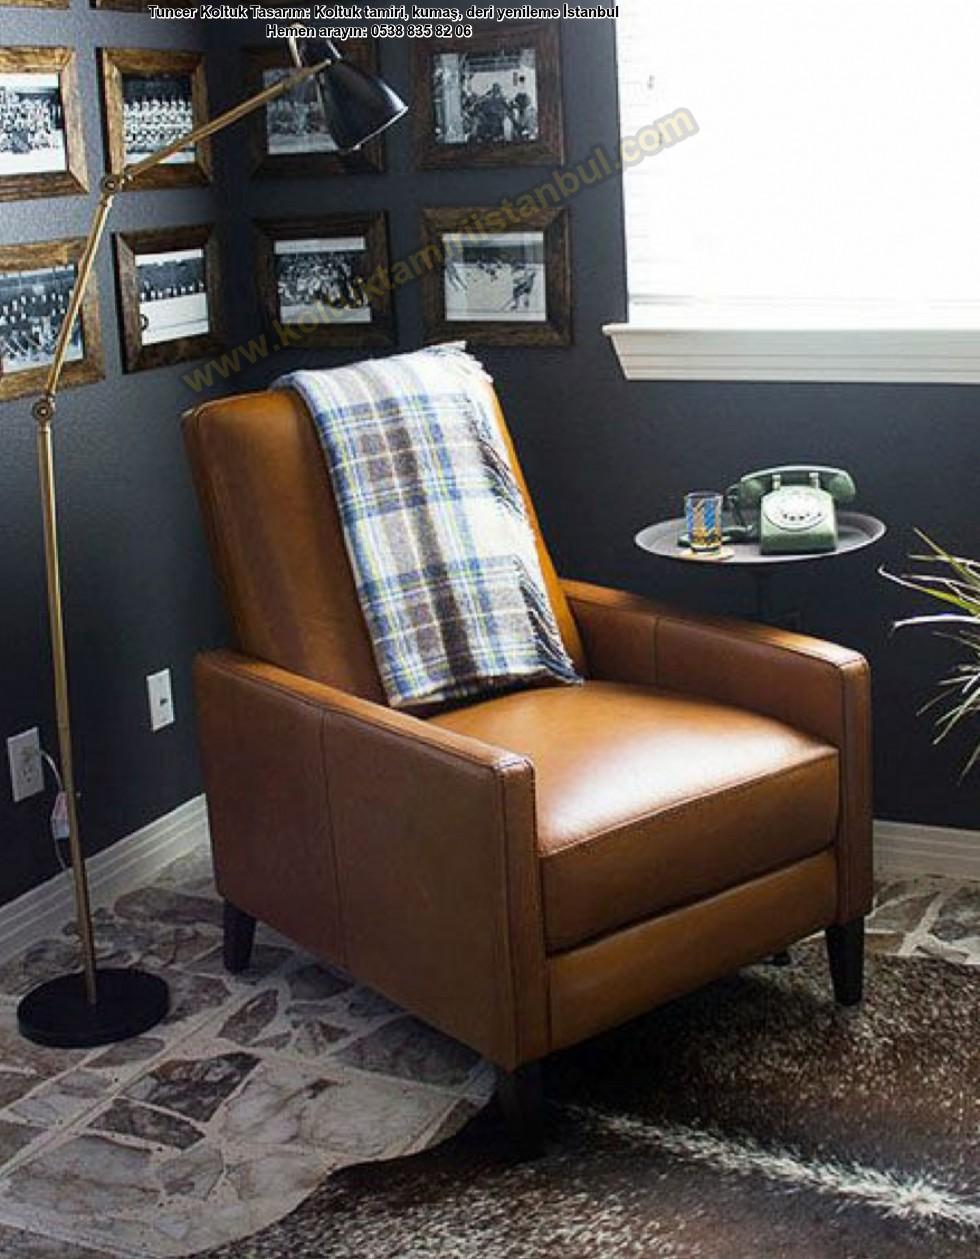 Vintage Ving Chair Models